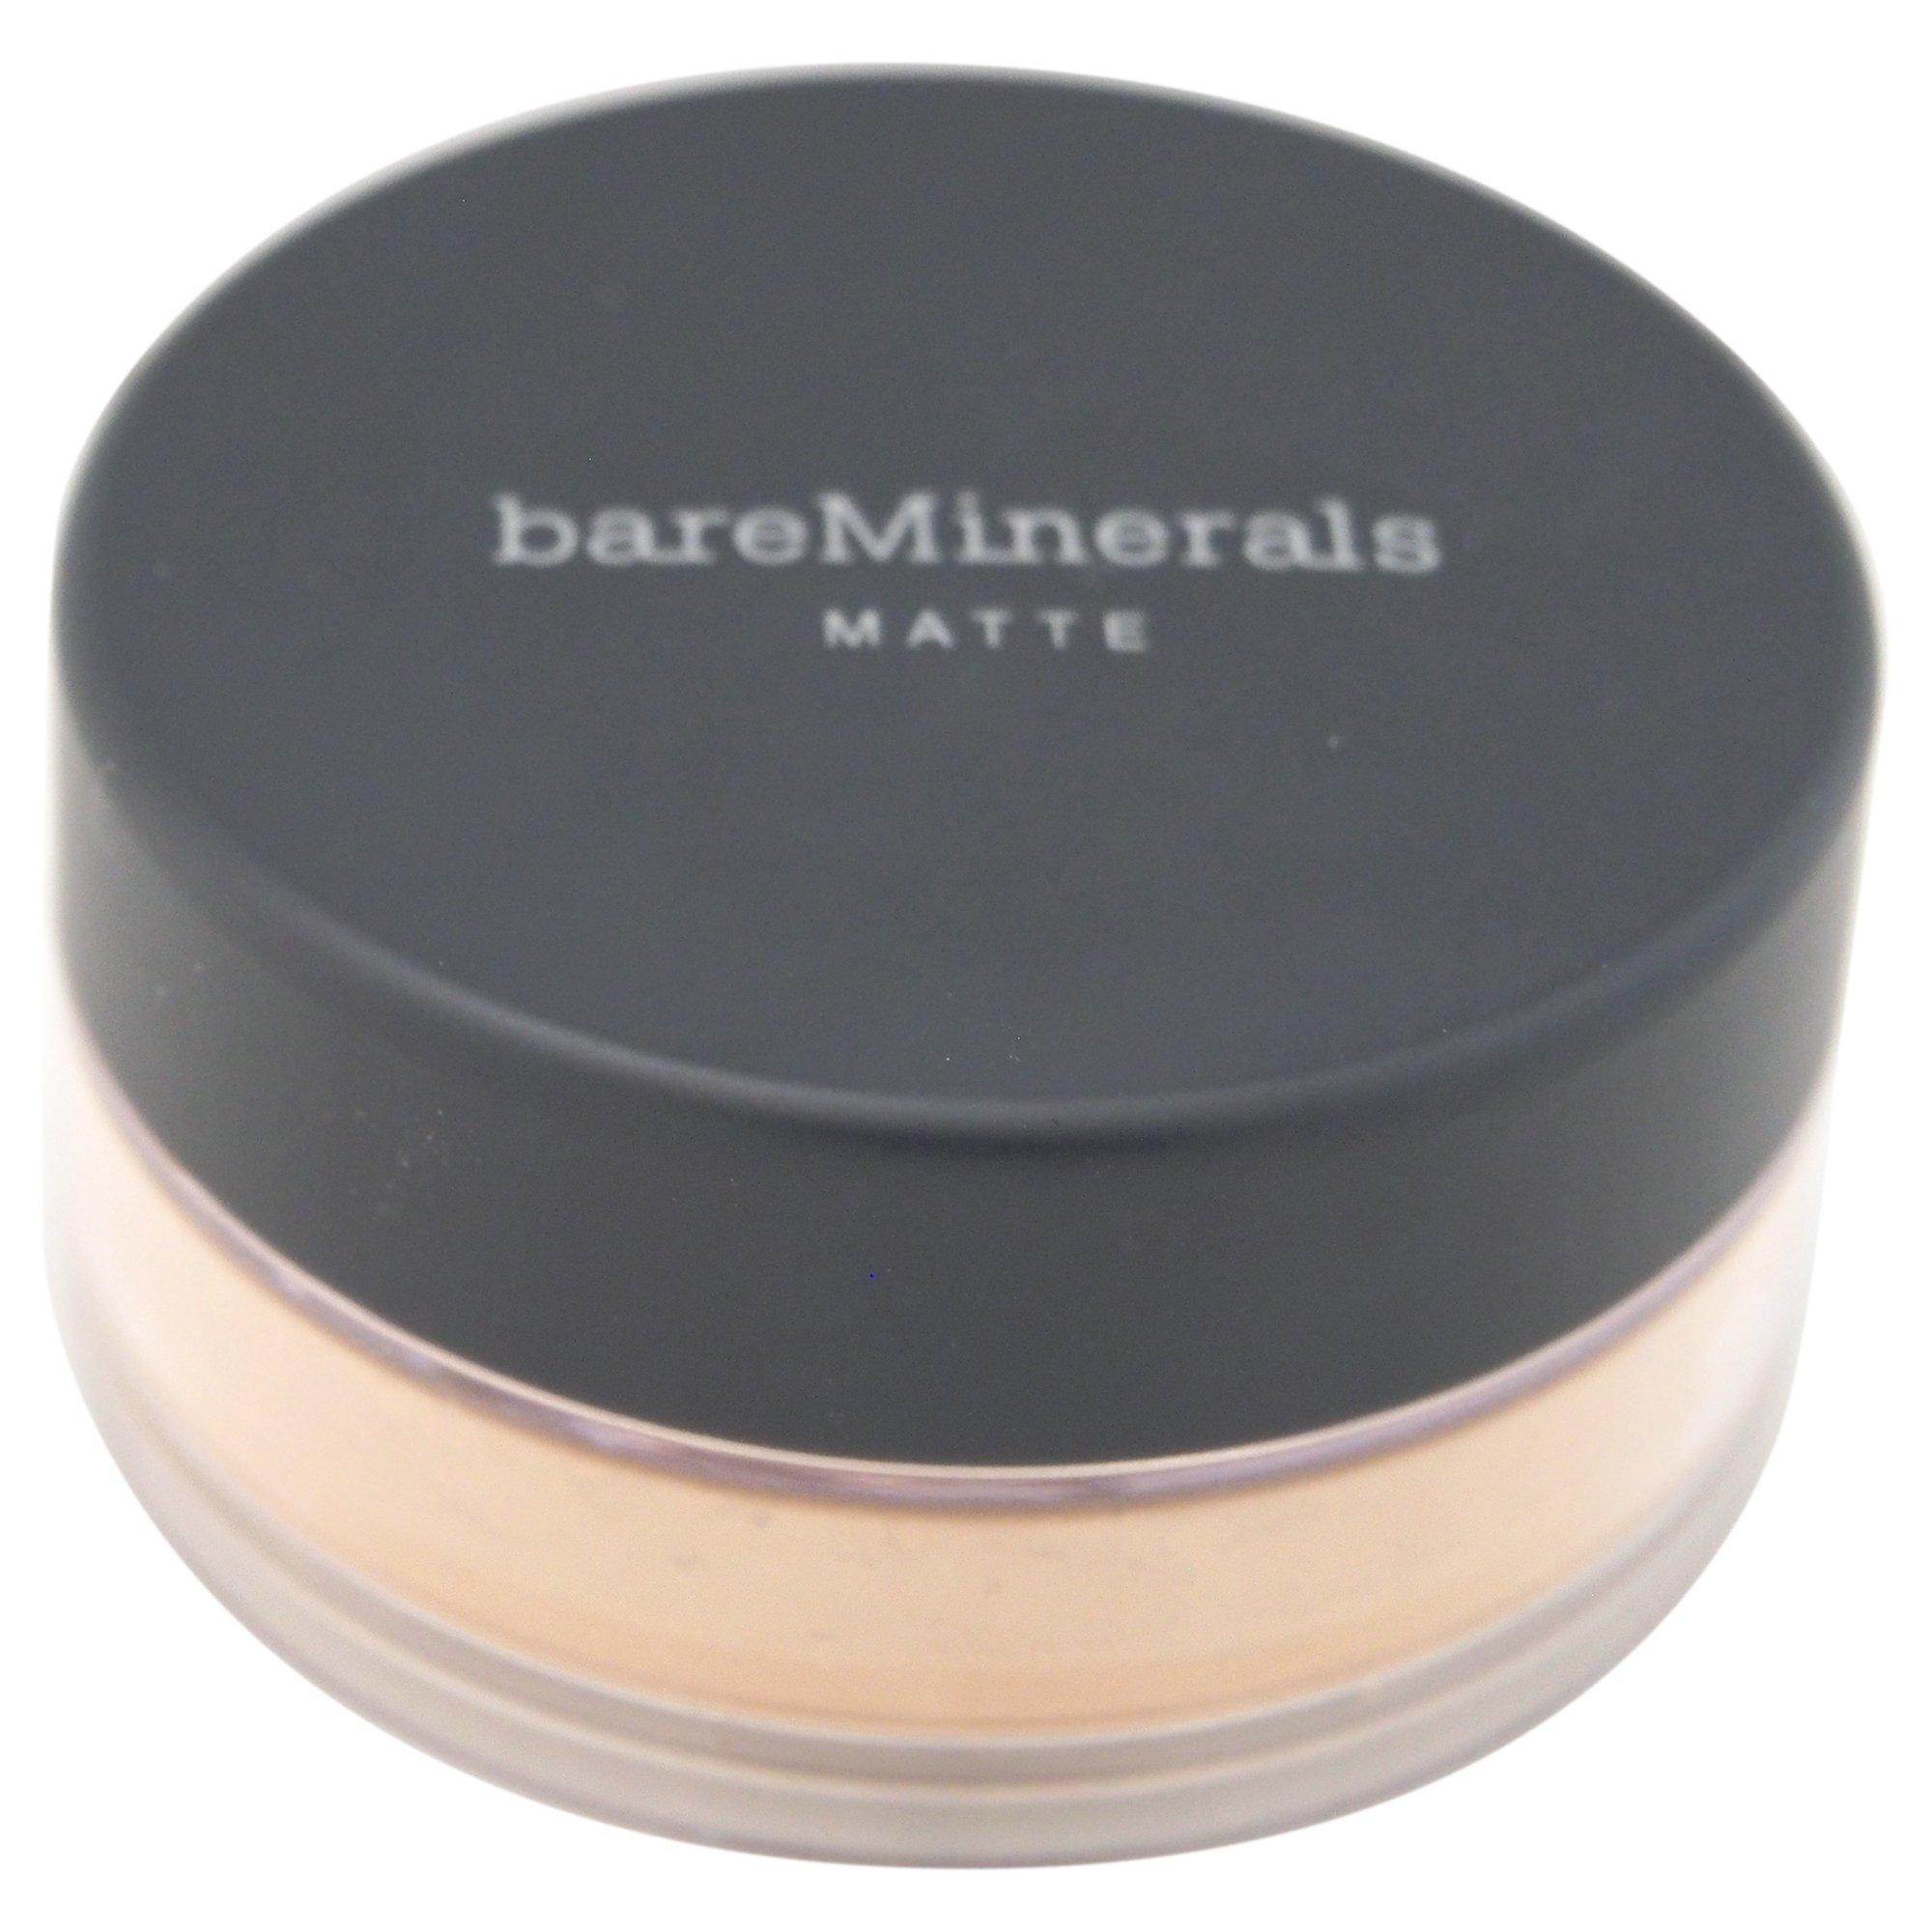 Bare Minerals Matte Foundation, Medium Tan, 0.21 Ounce